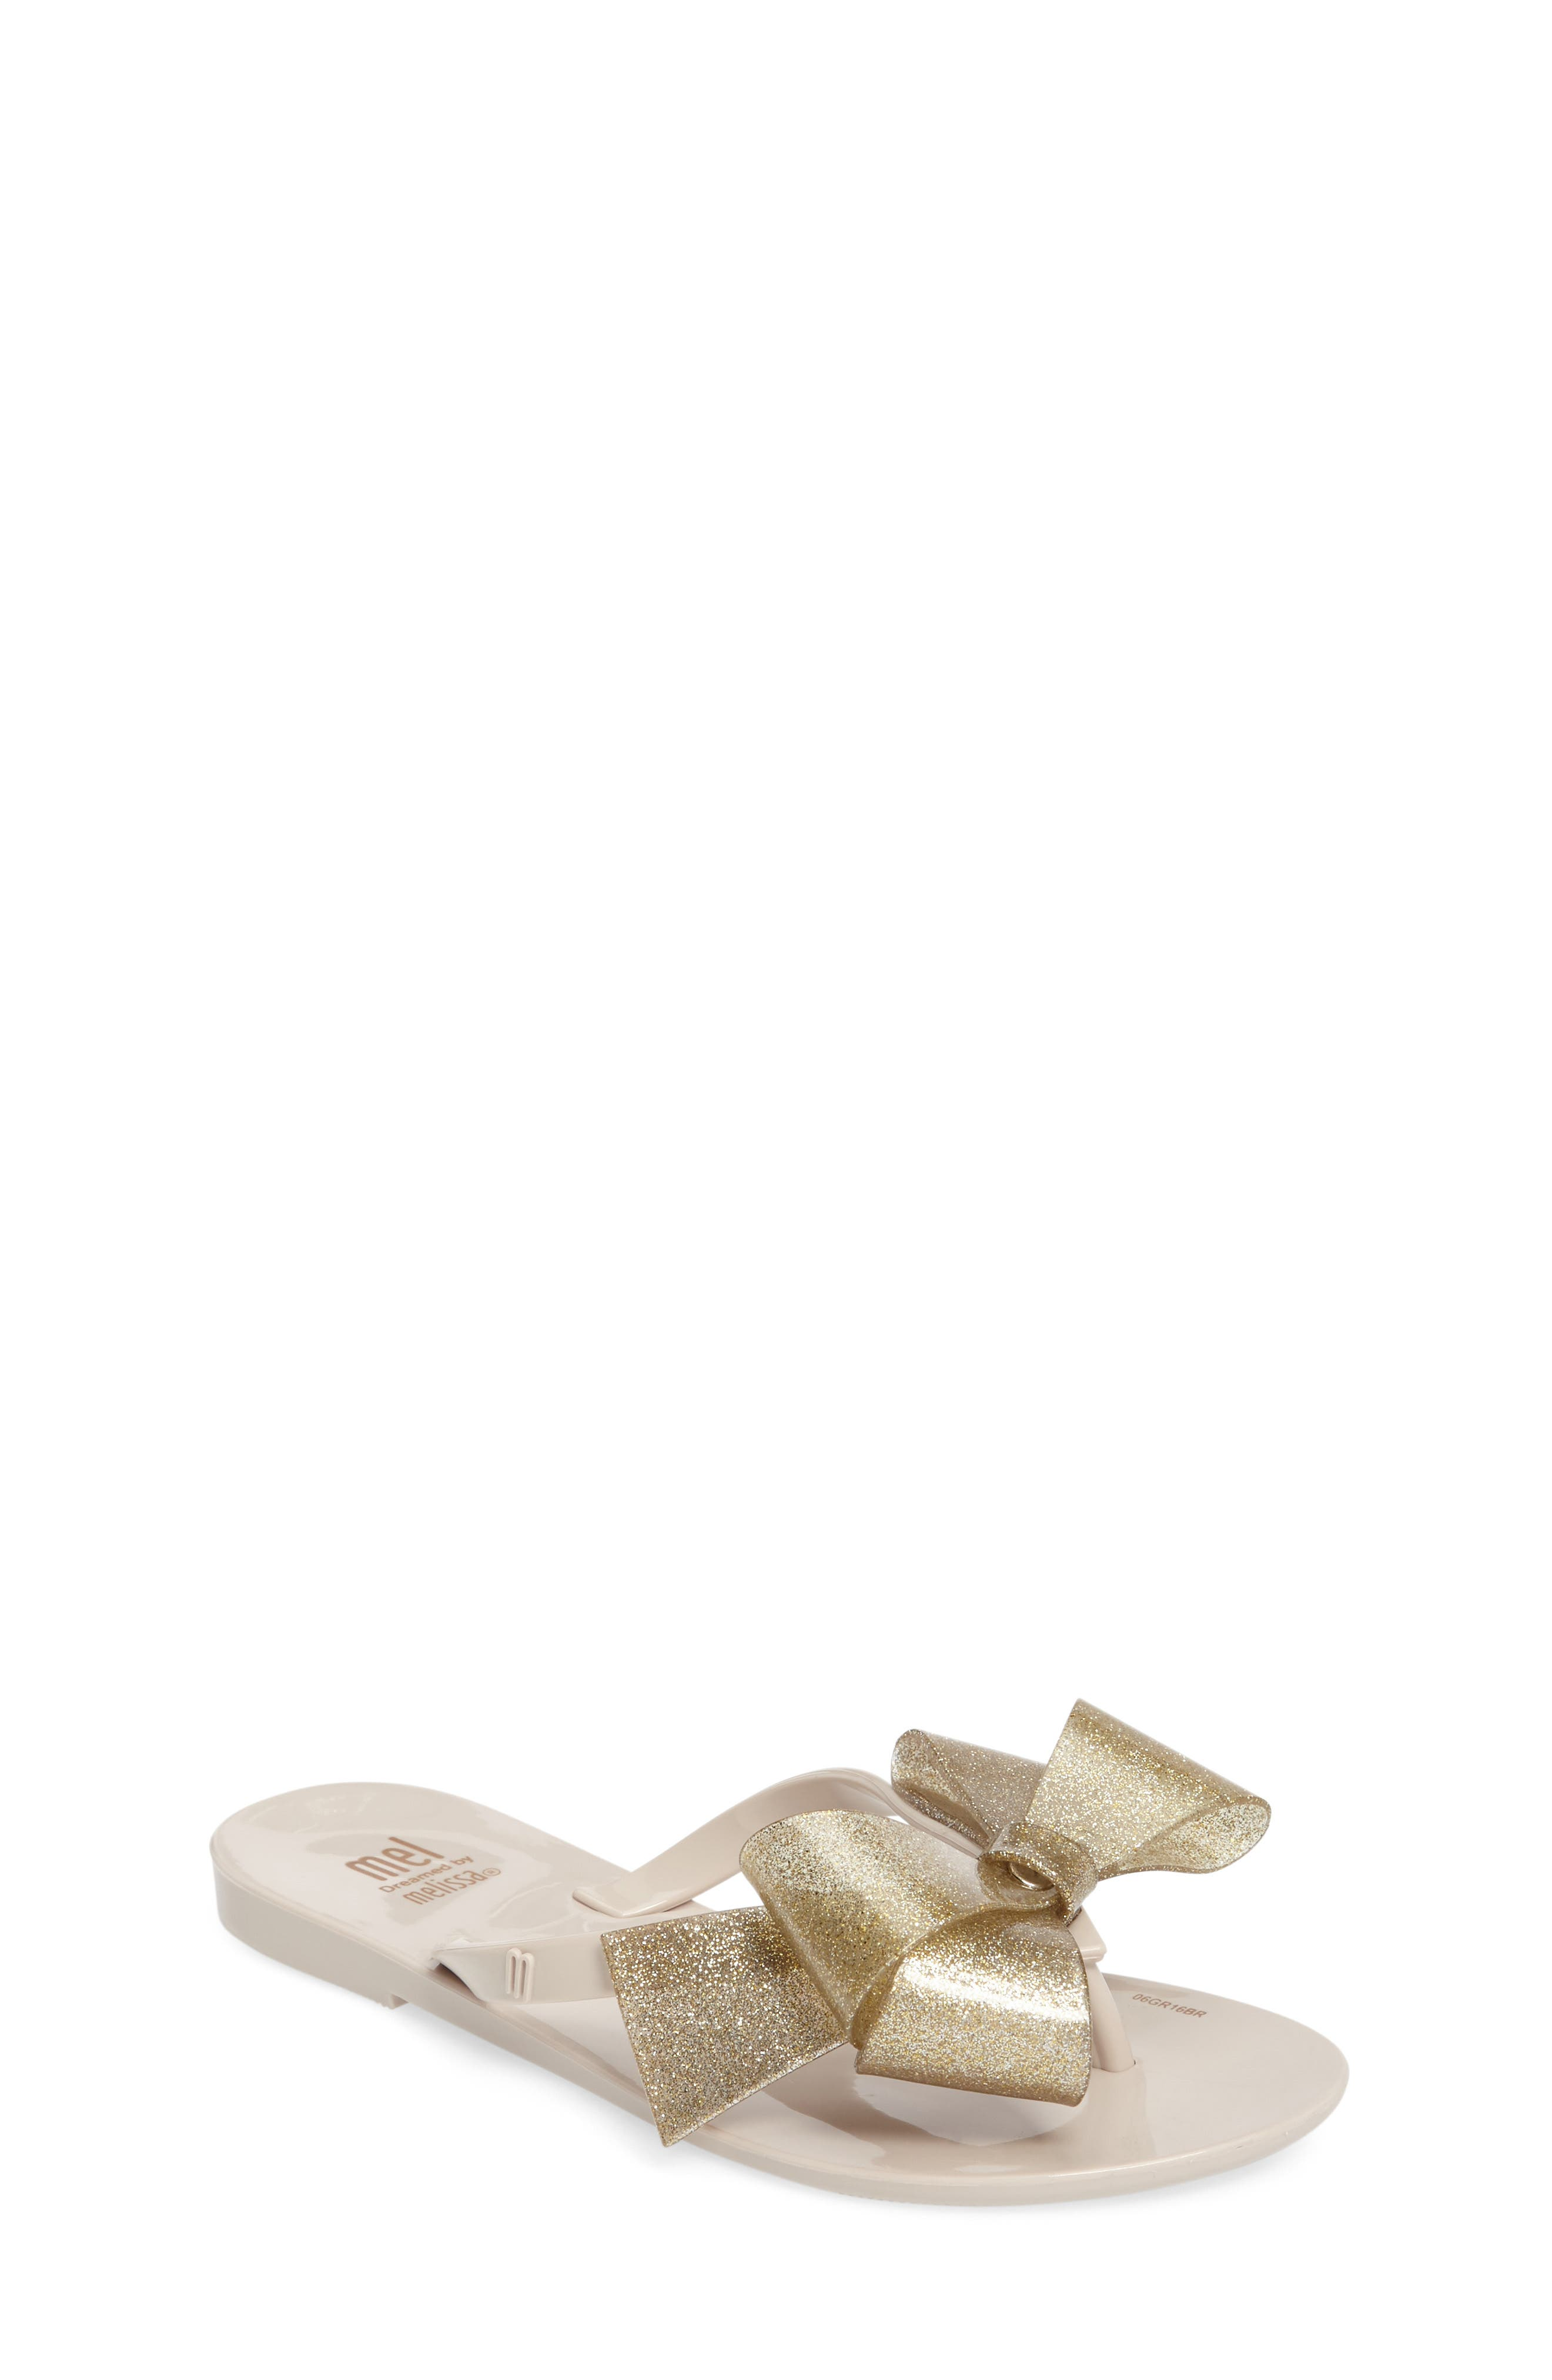 Harmonic Bow III Sandal,                         Main,                         color, Beige Gold Glitter